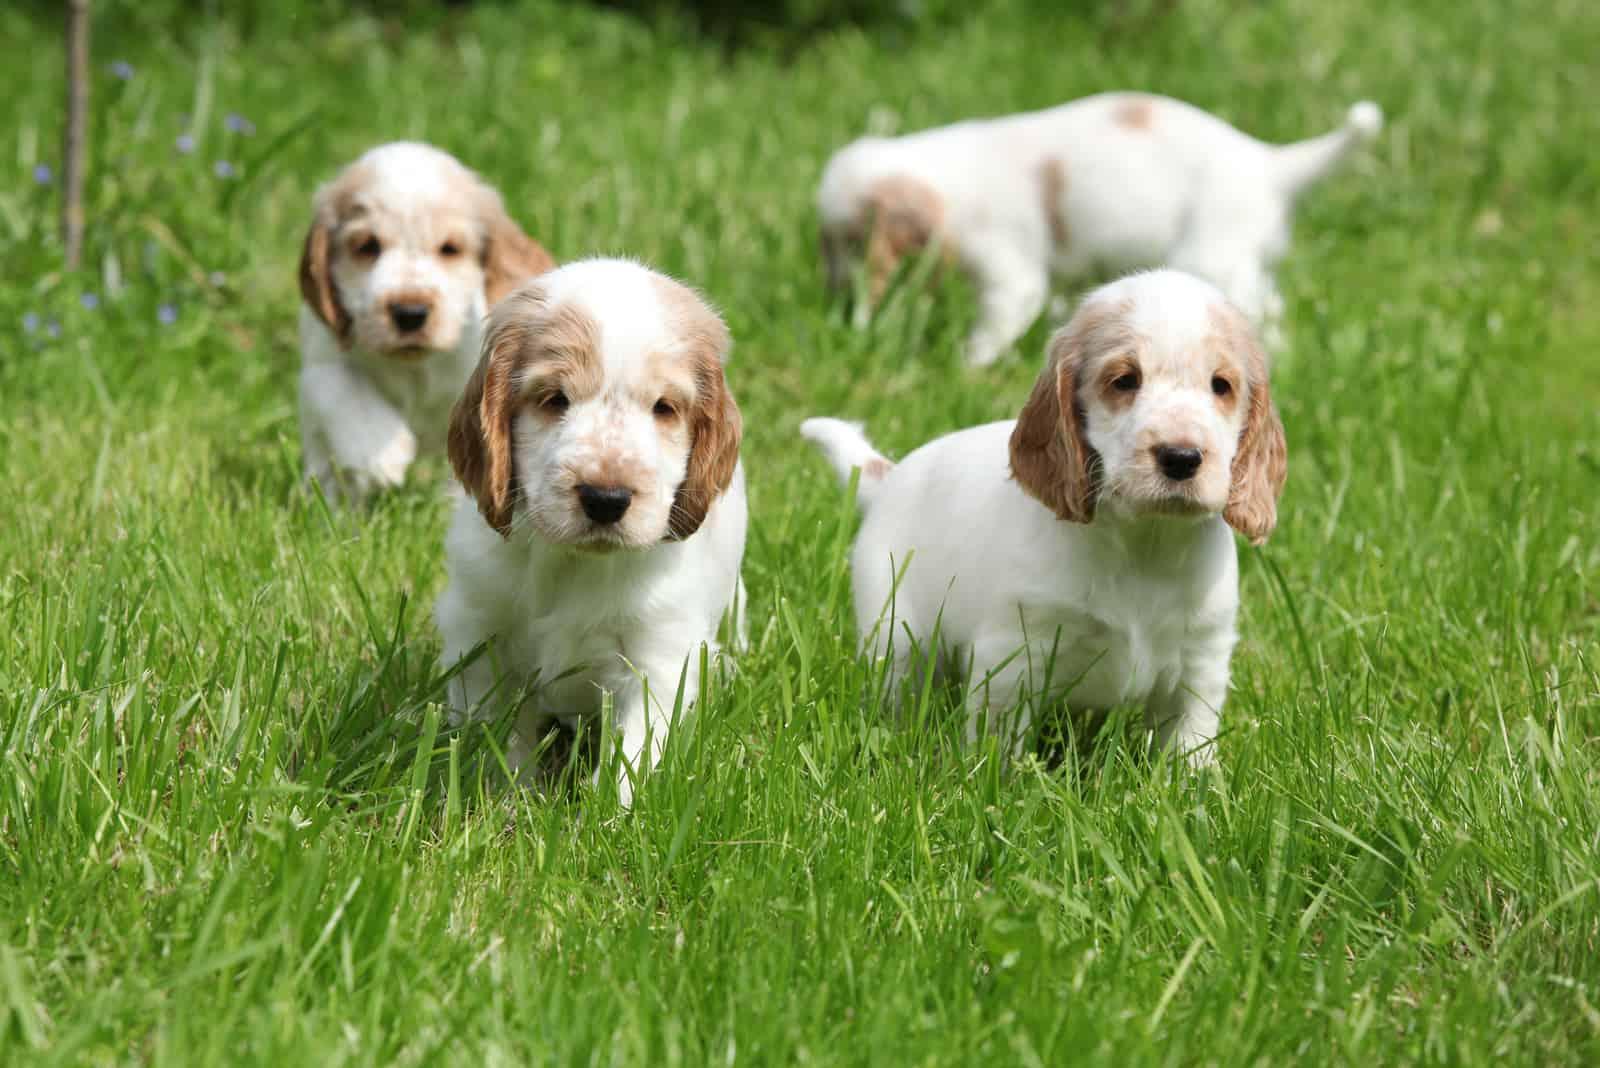 cocker spaniel puppies outdoors